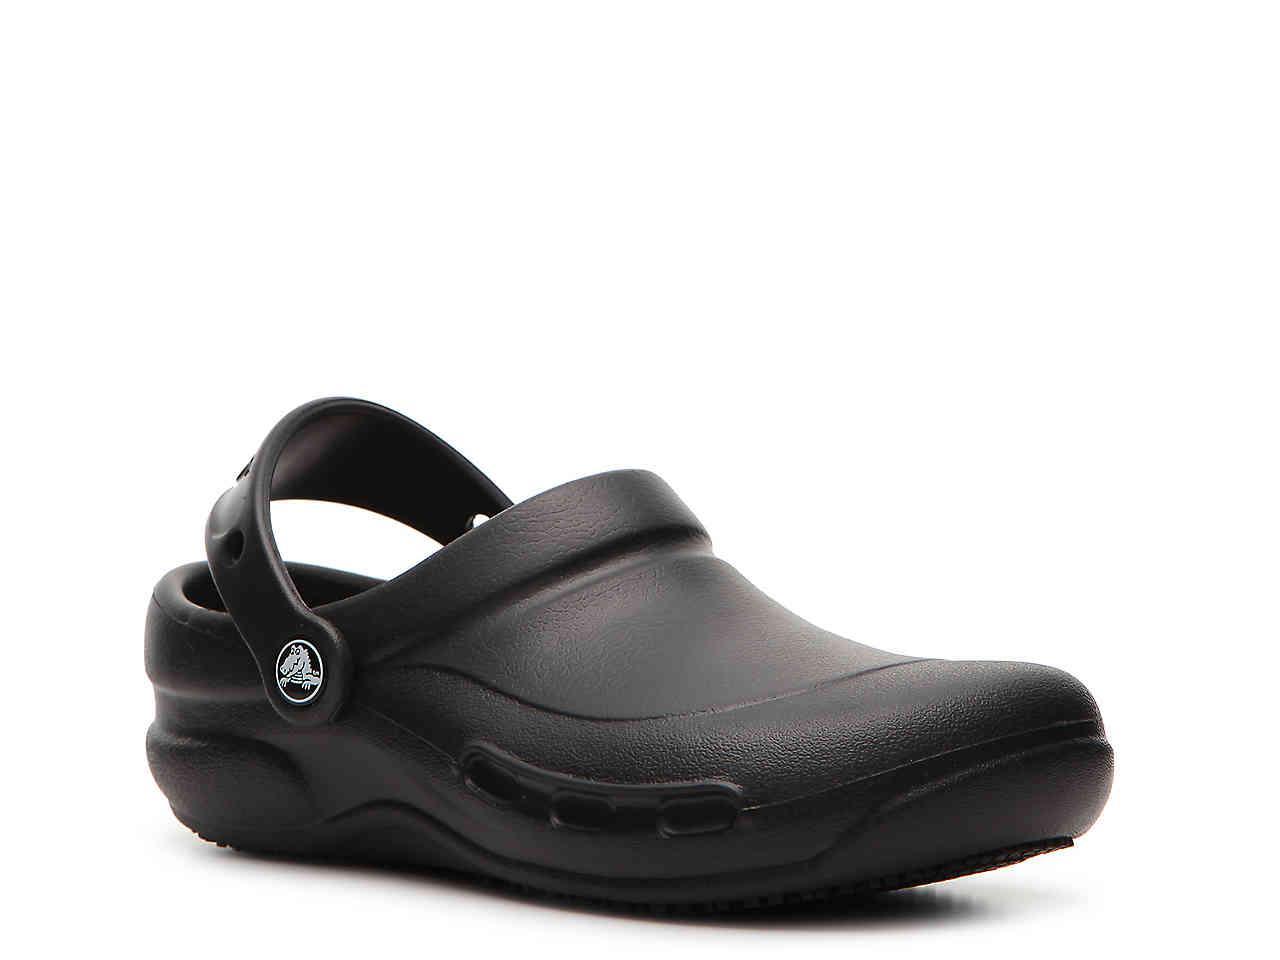 a88813633 Lyst - Crocs™ Bistro Work Clog in Black